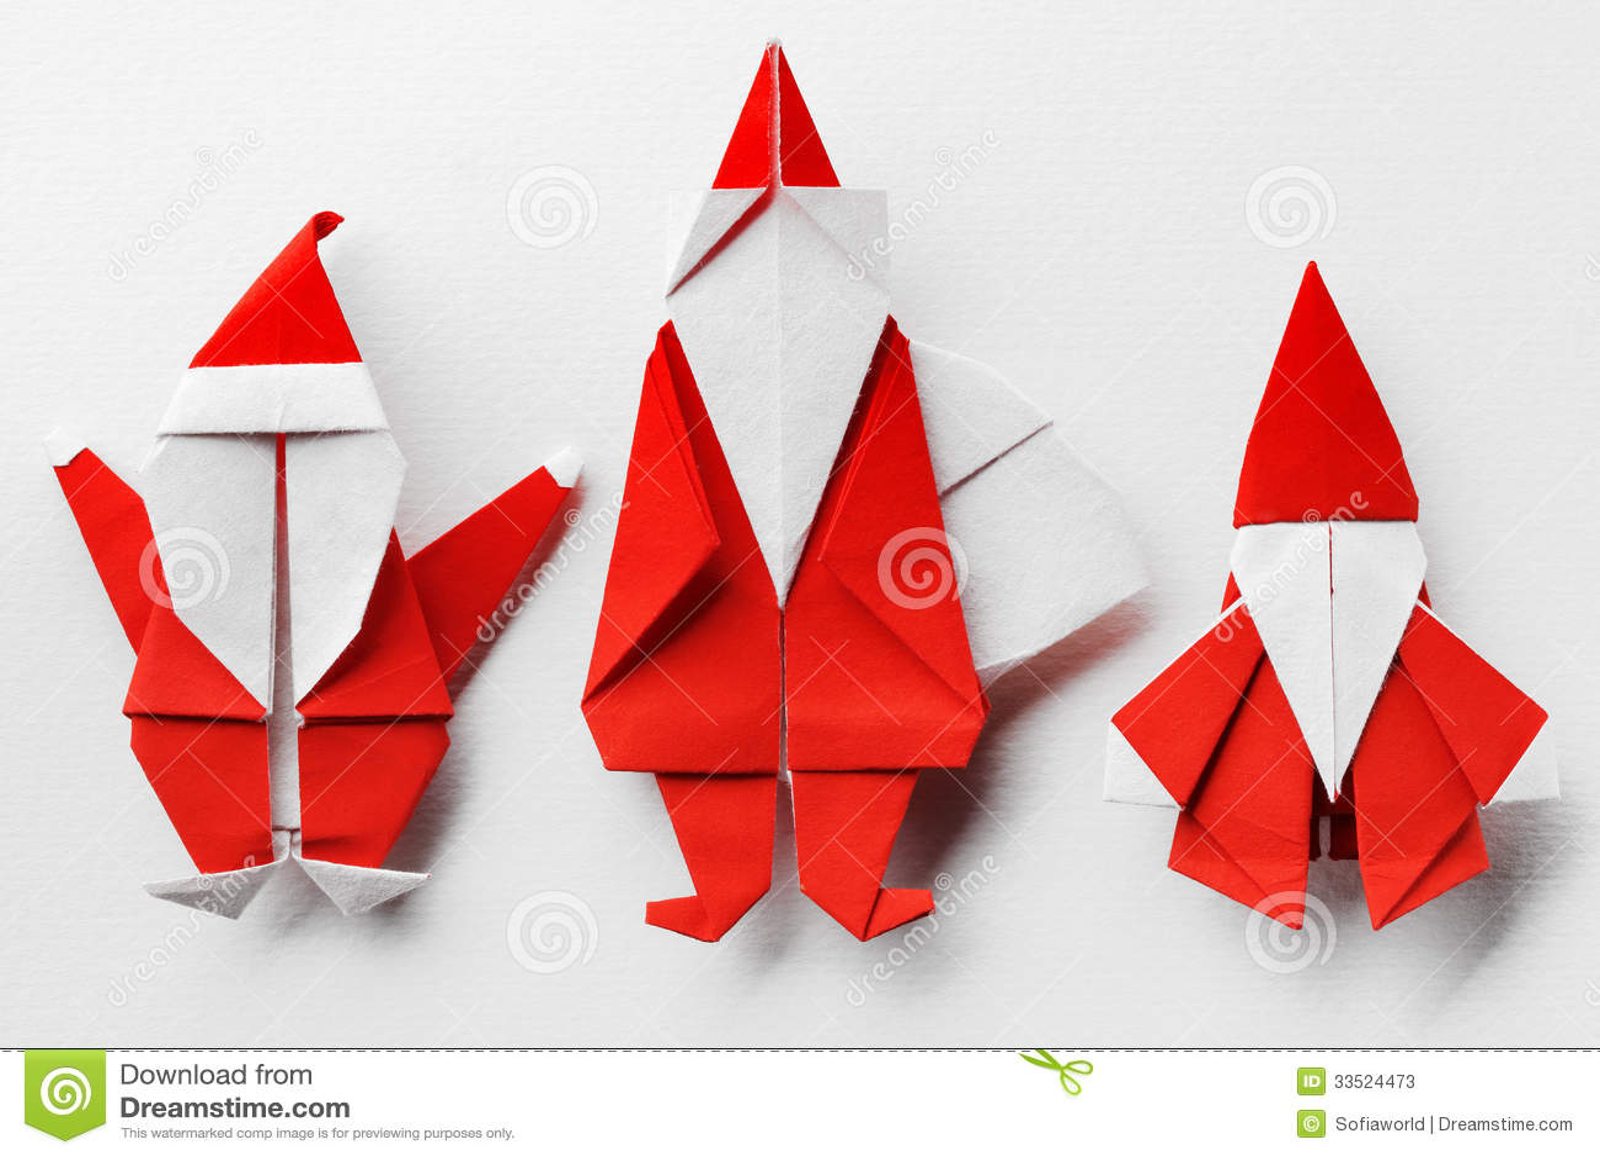 Santa Claus Stock Photos - Image: 33524473 - photo#28